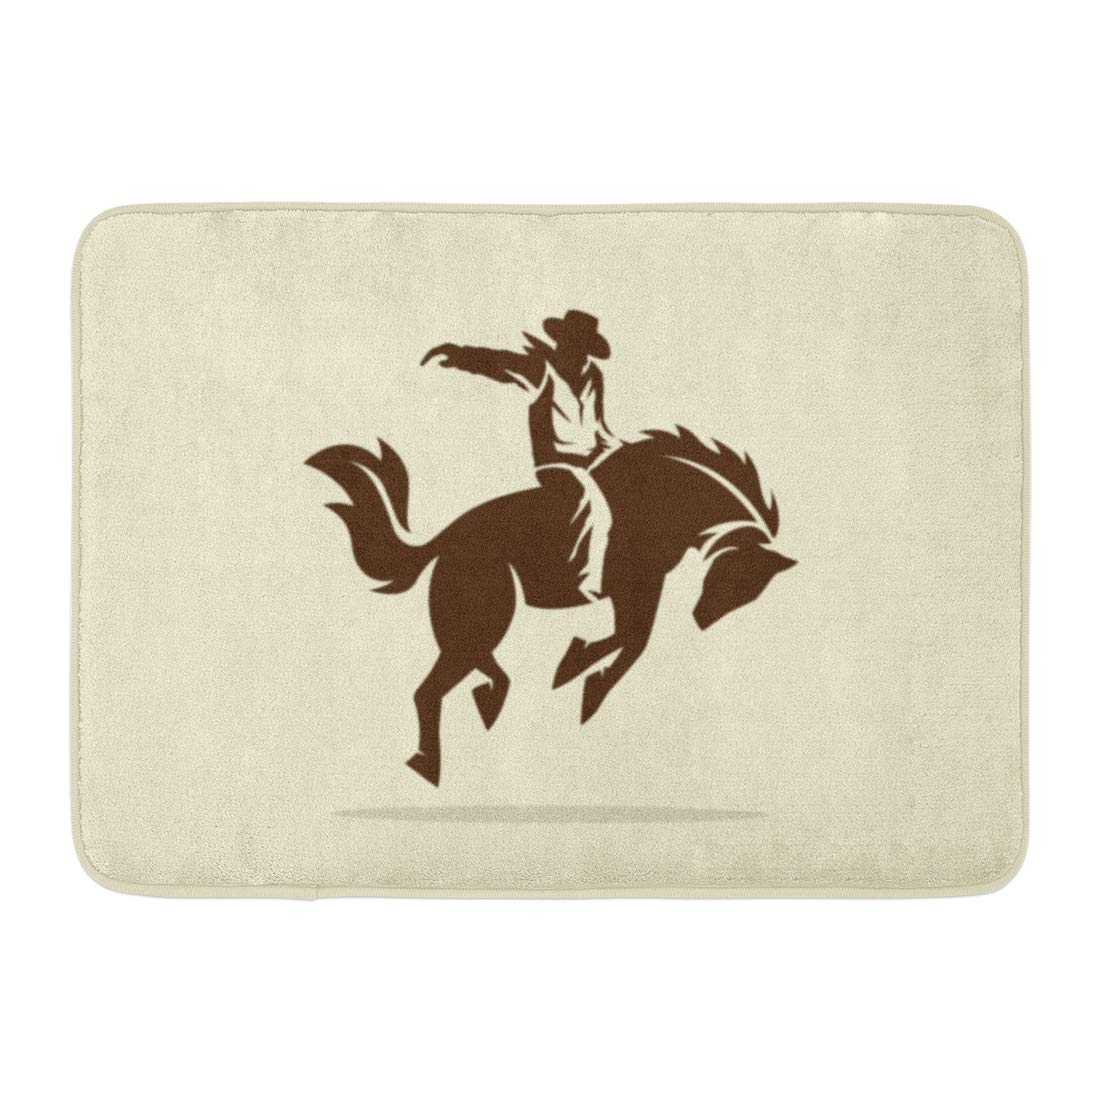 Godpok Silhouette Black Rodeo Of Cowboy Riding Wild Horse Bronco Bucking Rug Doormat Bath Mat 23 6x15 7 Inch Walmart Com Walmart Com